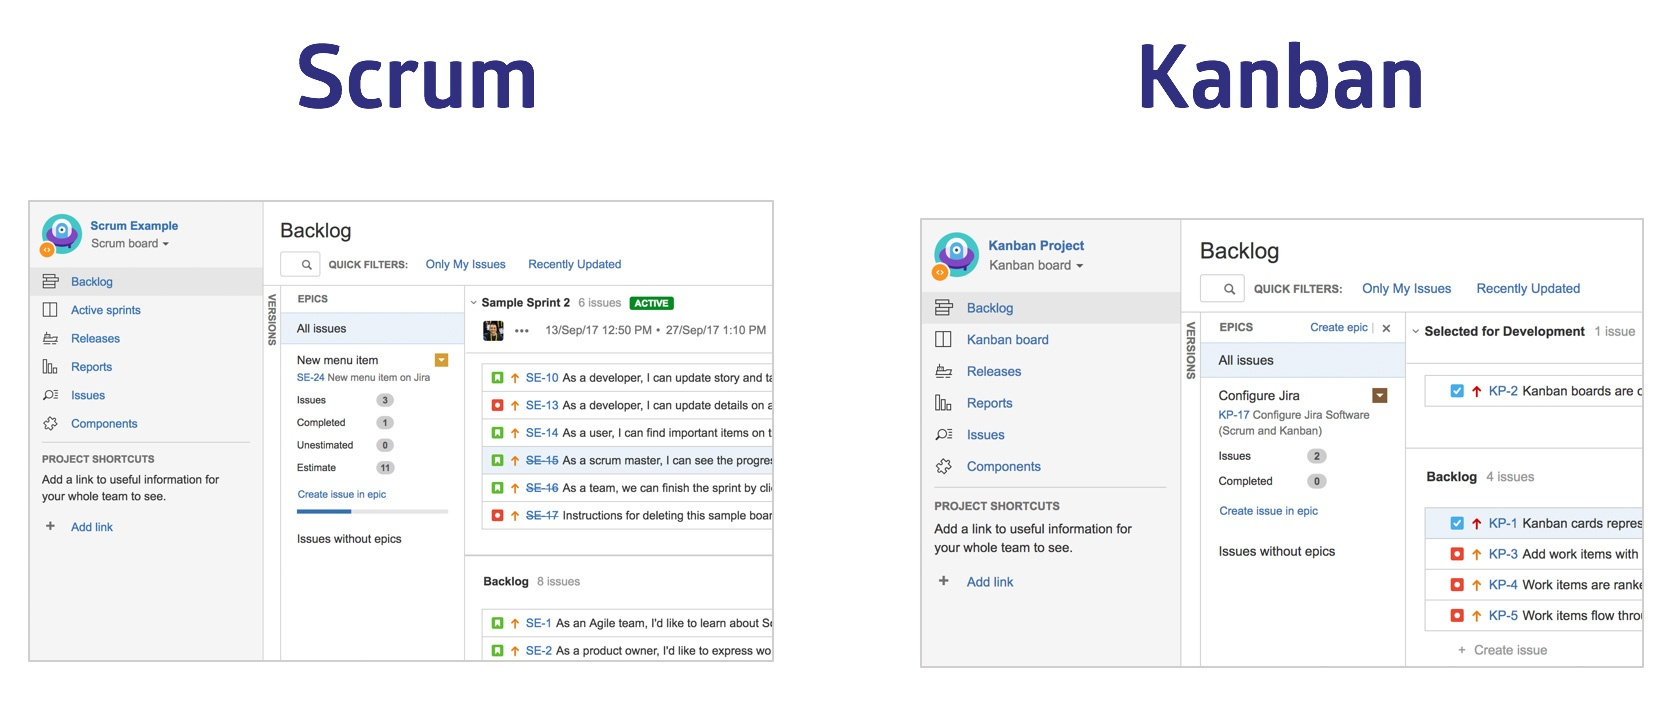 epicas-en-backlog_jira-configuracion-tableros-boards-scrum-kanban-software-7-5_Atlassian-en-espana_DEISER